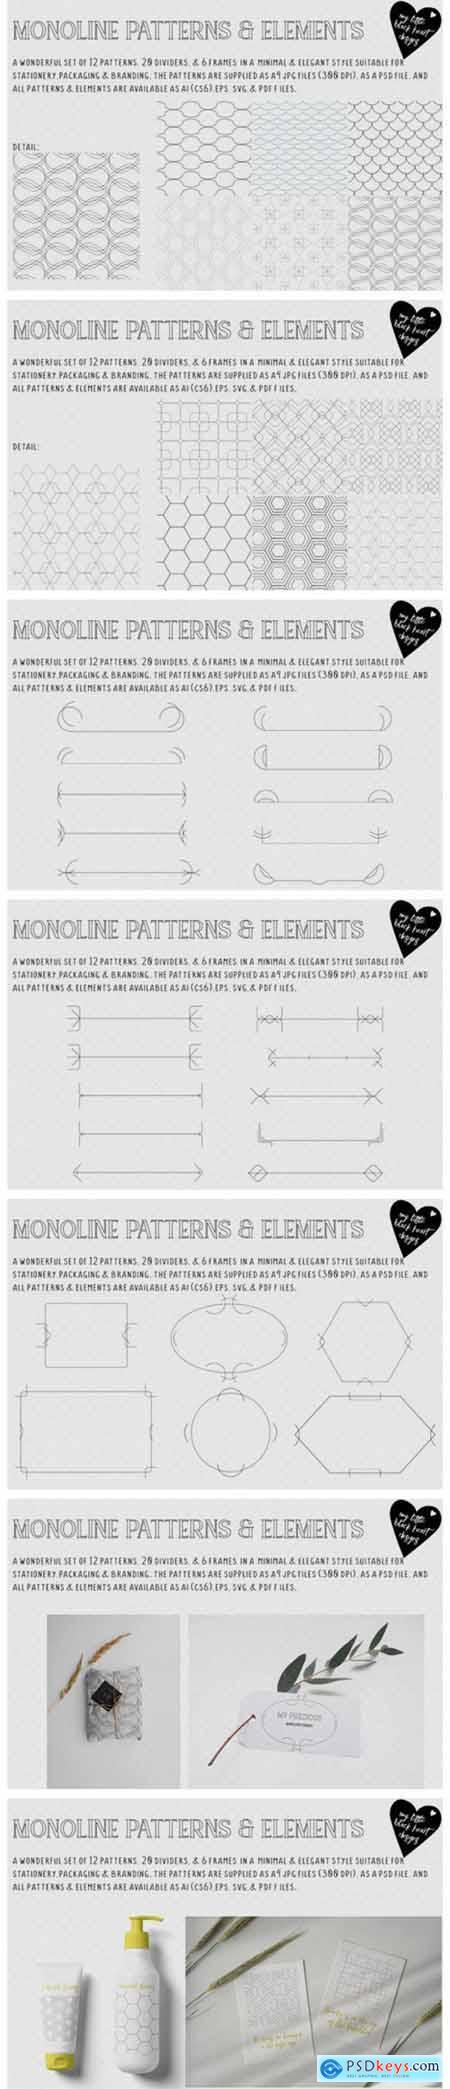 Monoline Patterns & Elements 6244413